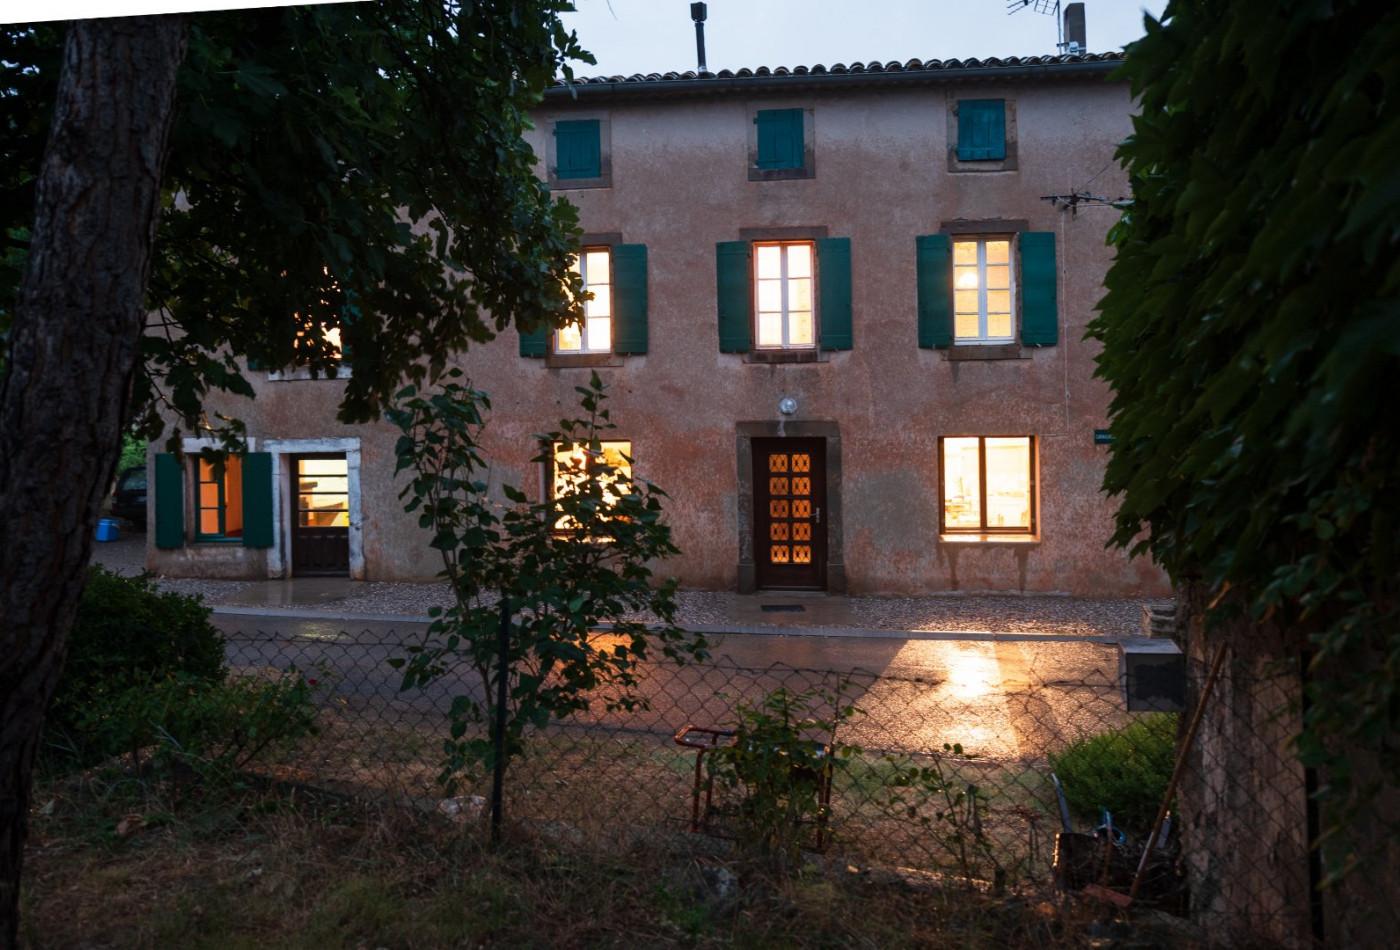 A vendre  Lezignan Corbieres | Réf 340138107 - Agence galerie casanova